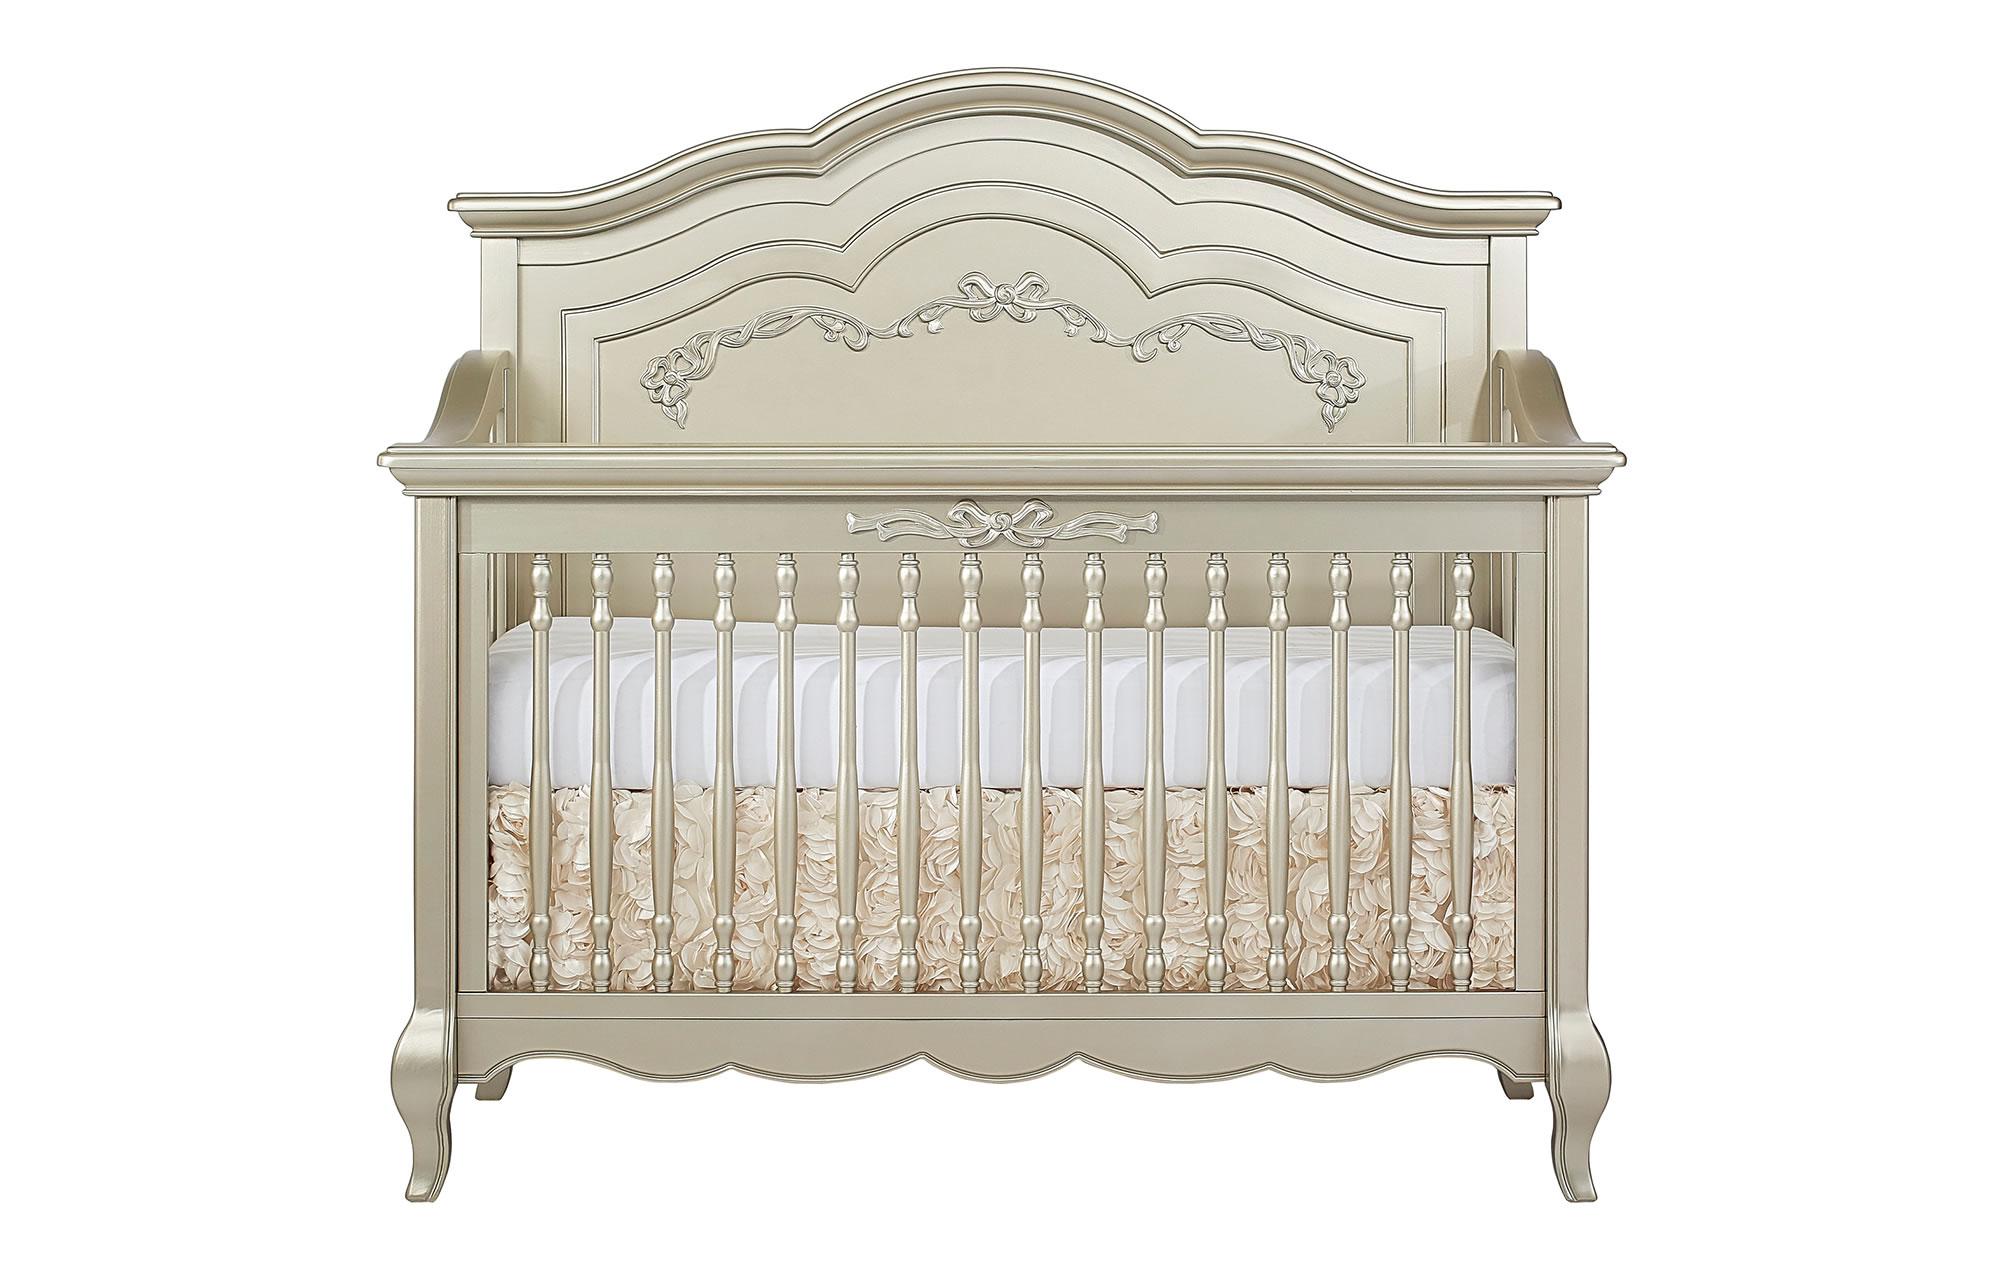 832-GD Aurora Convertible Crib Silo Front